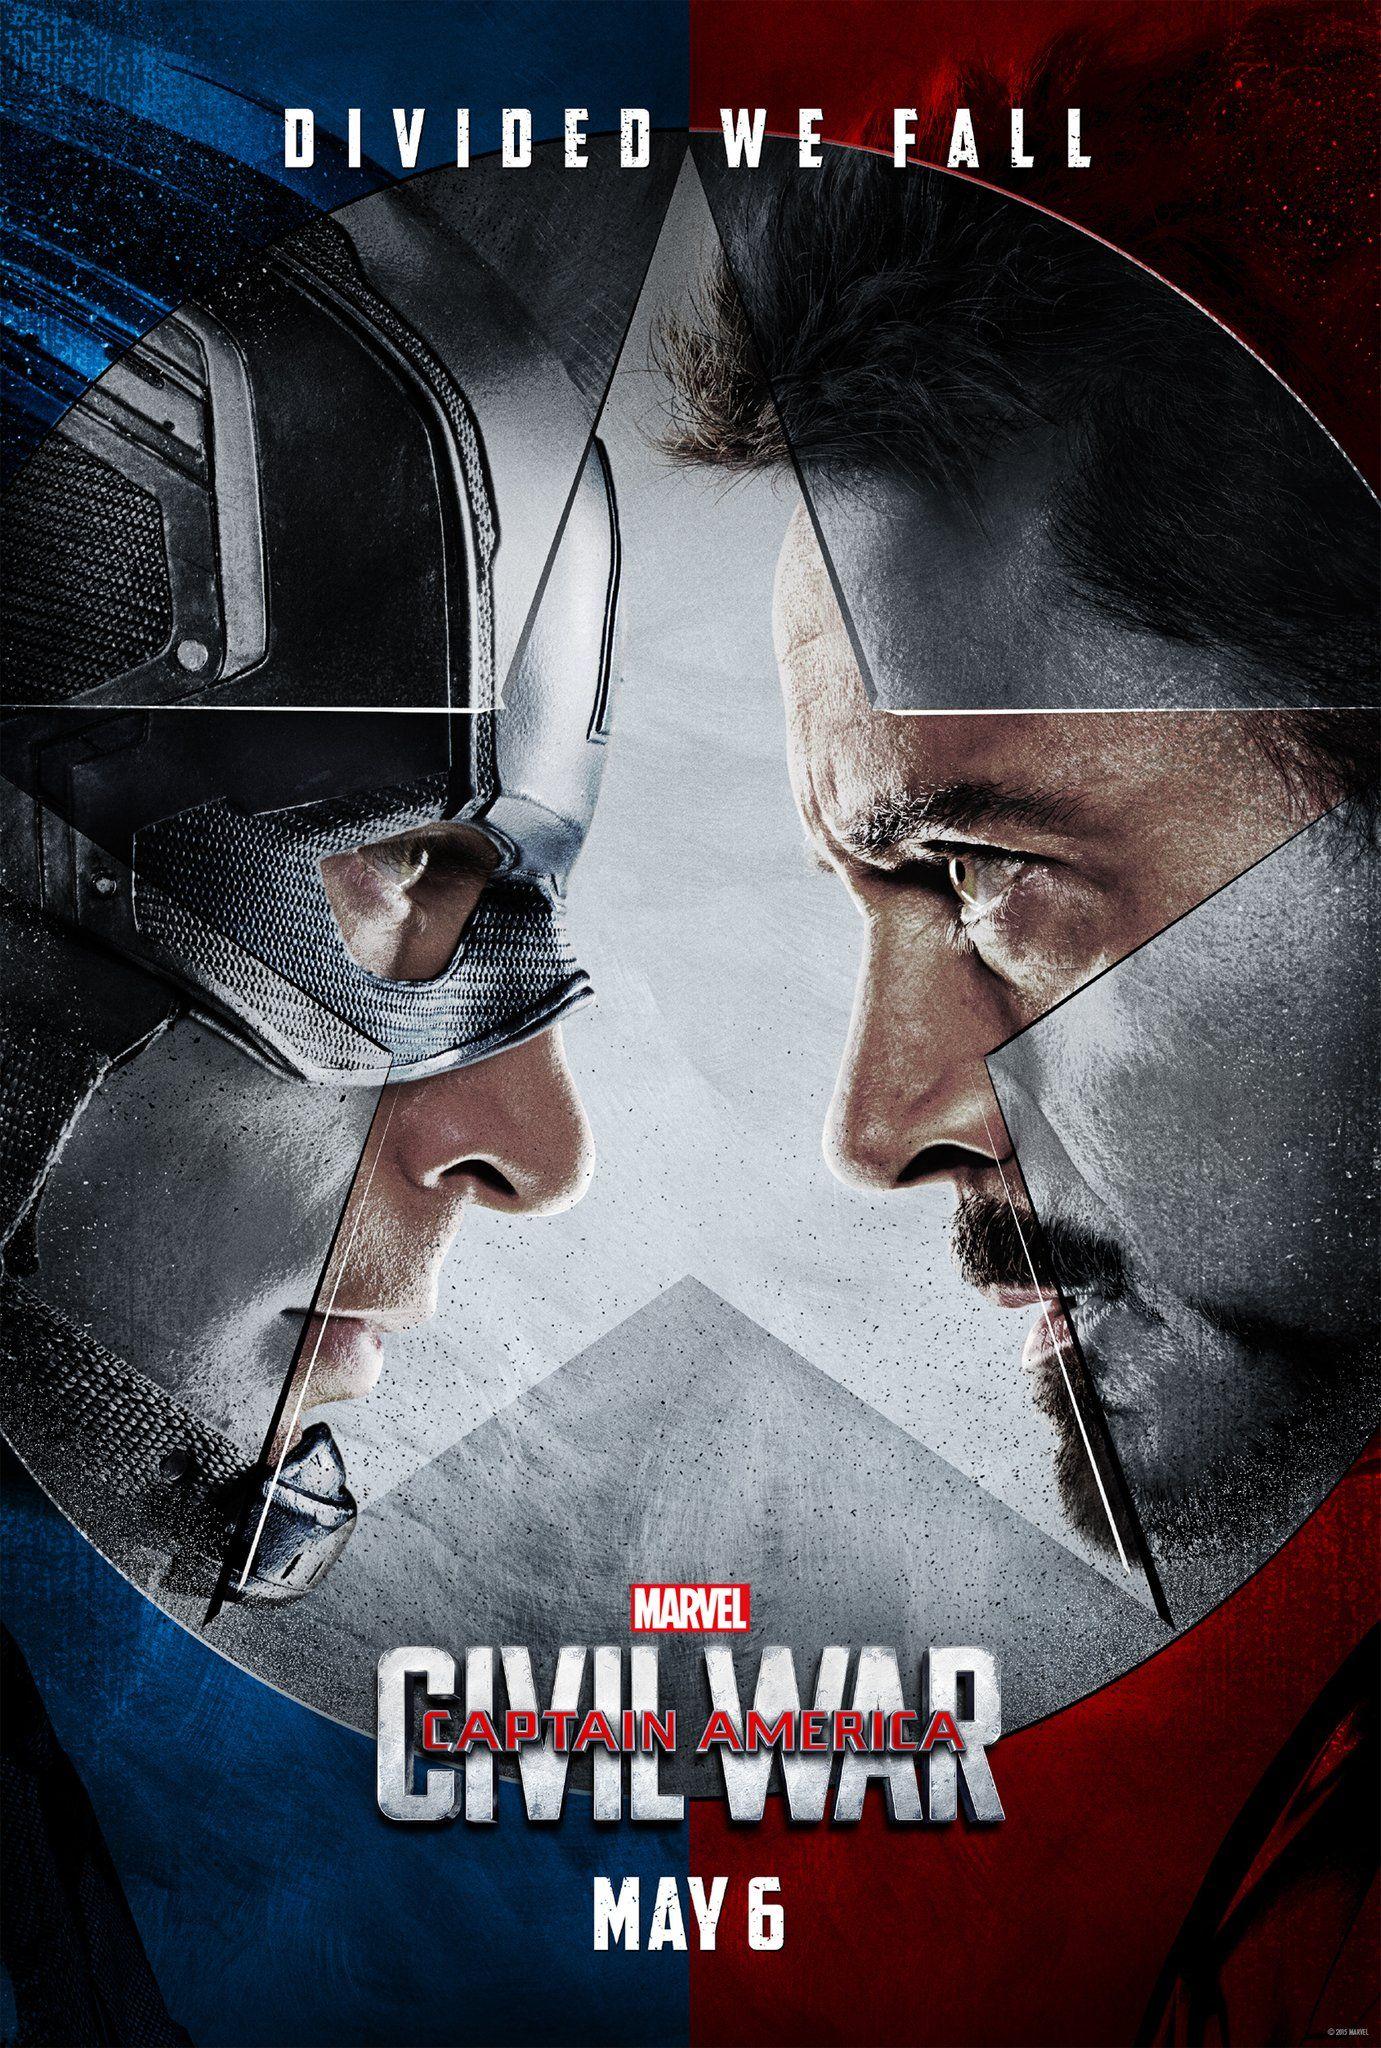 Captain America Civil War 2016 Movie Pelicula Capitan America